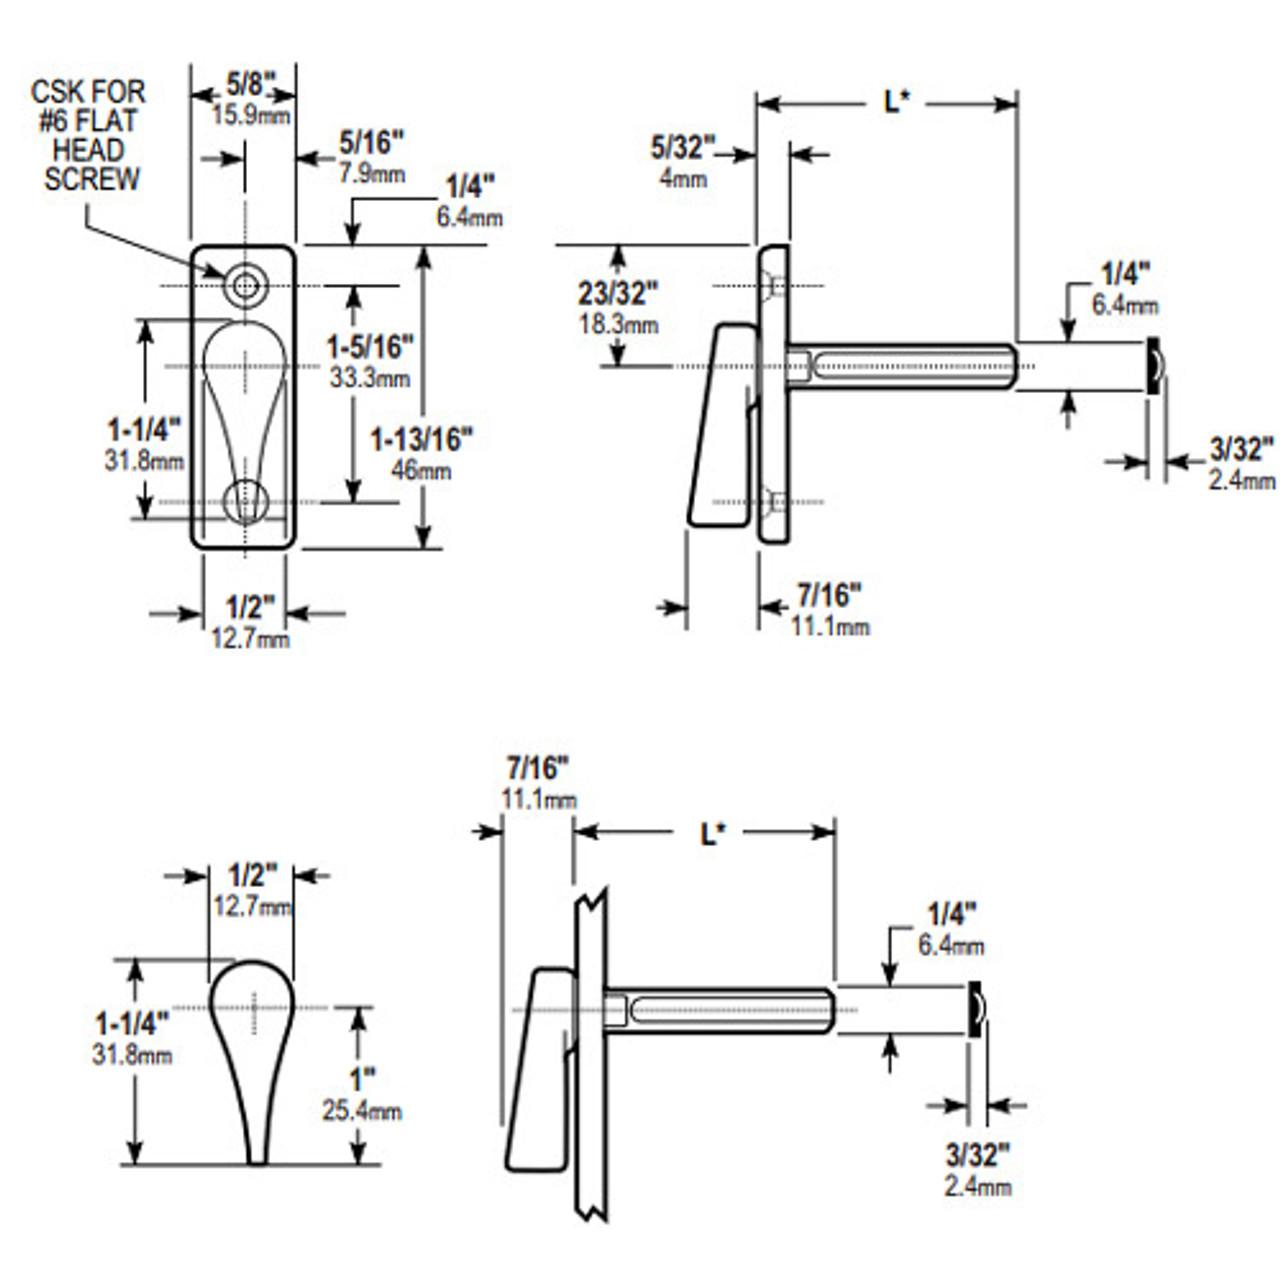 1000-21-16-130 Adams Rite 1000 Series Turns Dimensional View